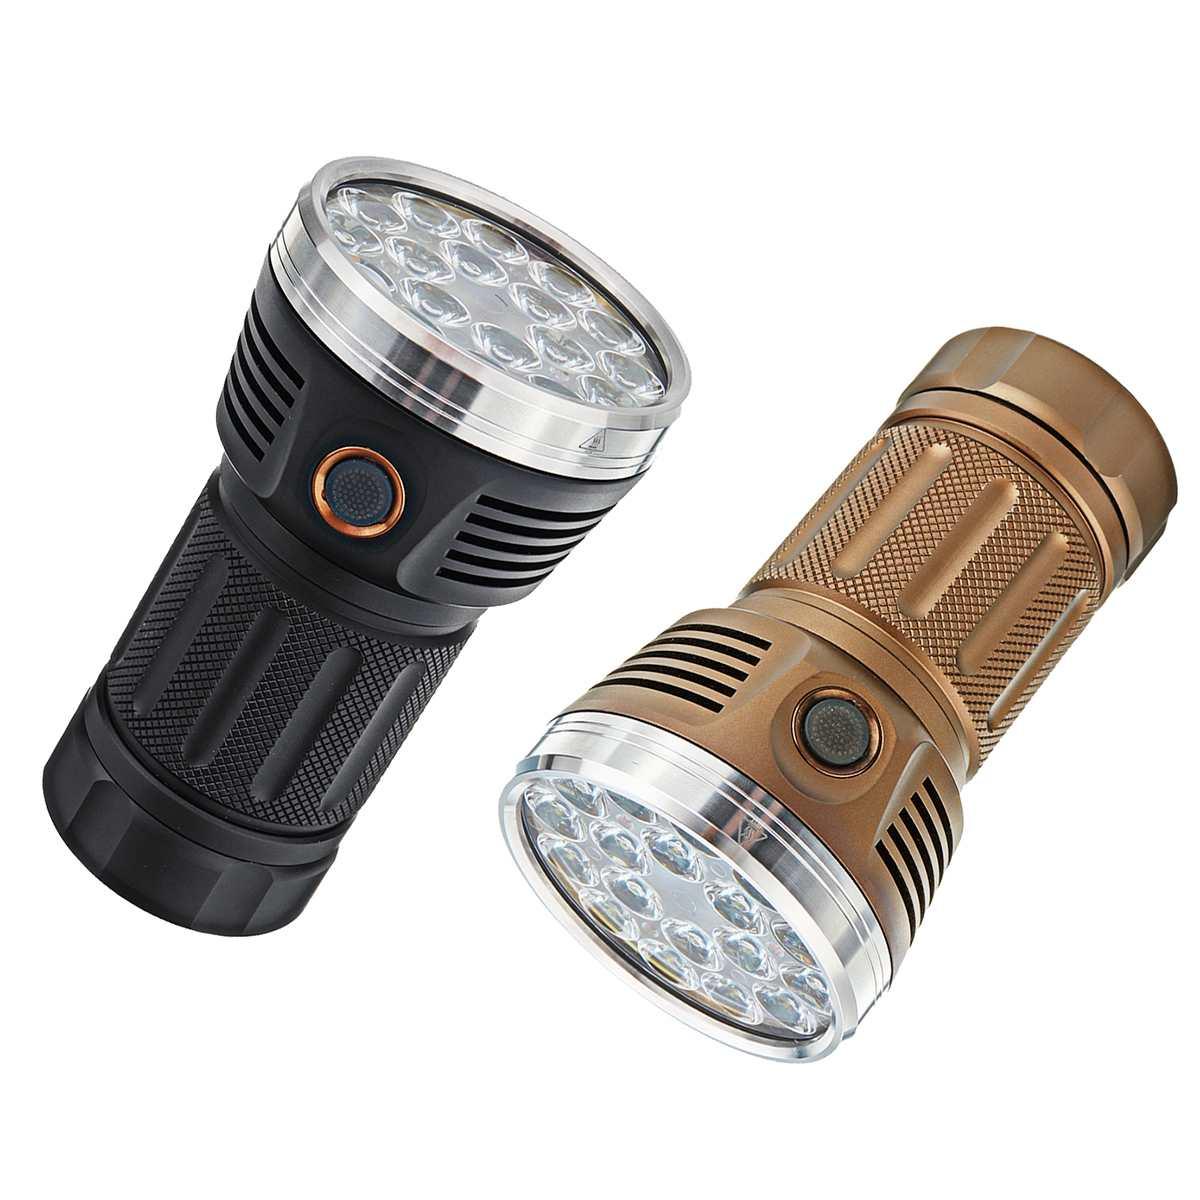 Astrolux MF01S 18x SST20 15000LM 616M Anduril UI 18650 Flashlight High CRI Bright Searching Flashlight Hunting Torch Detector